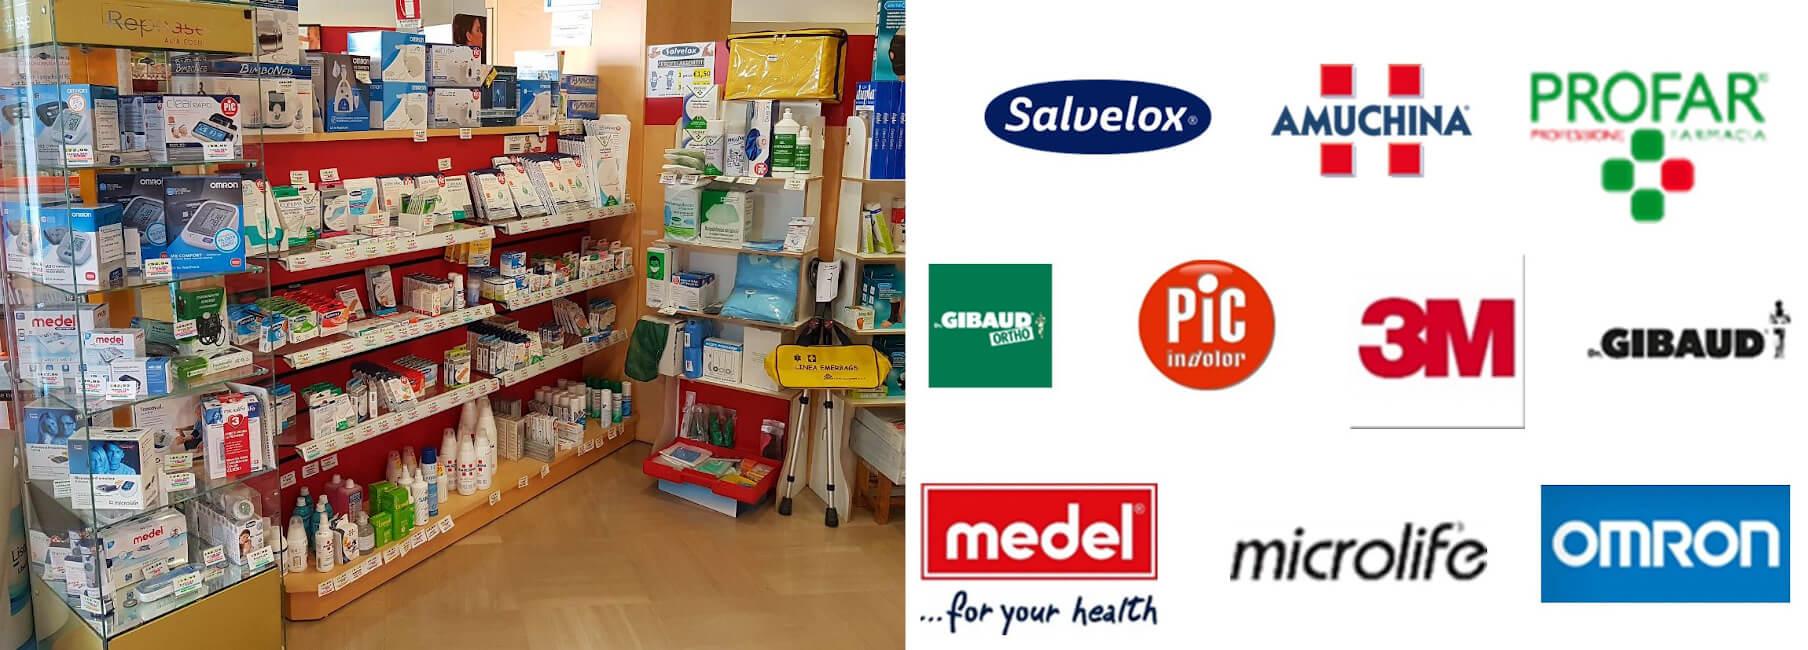 marchi-sanitaria-farmacia